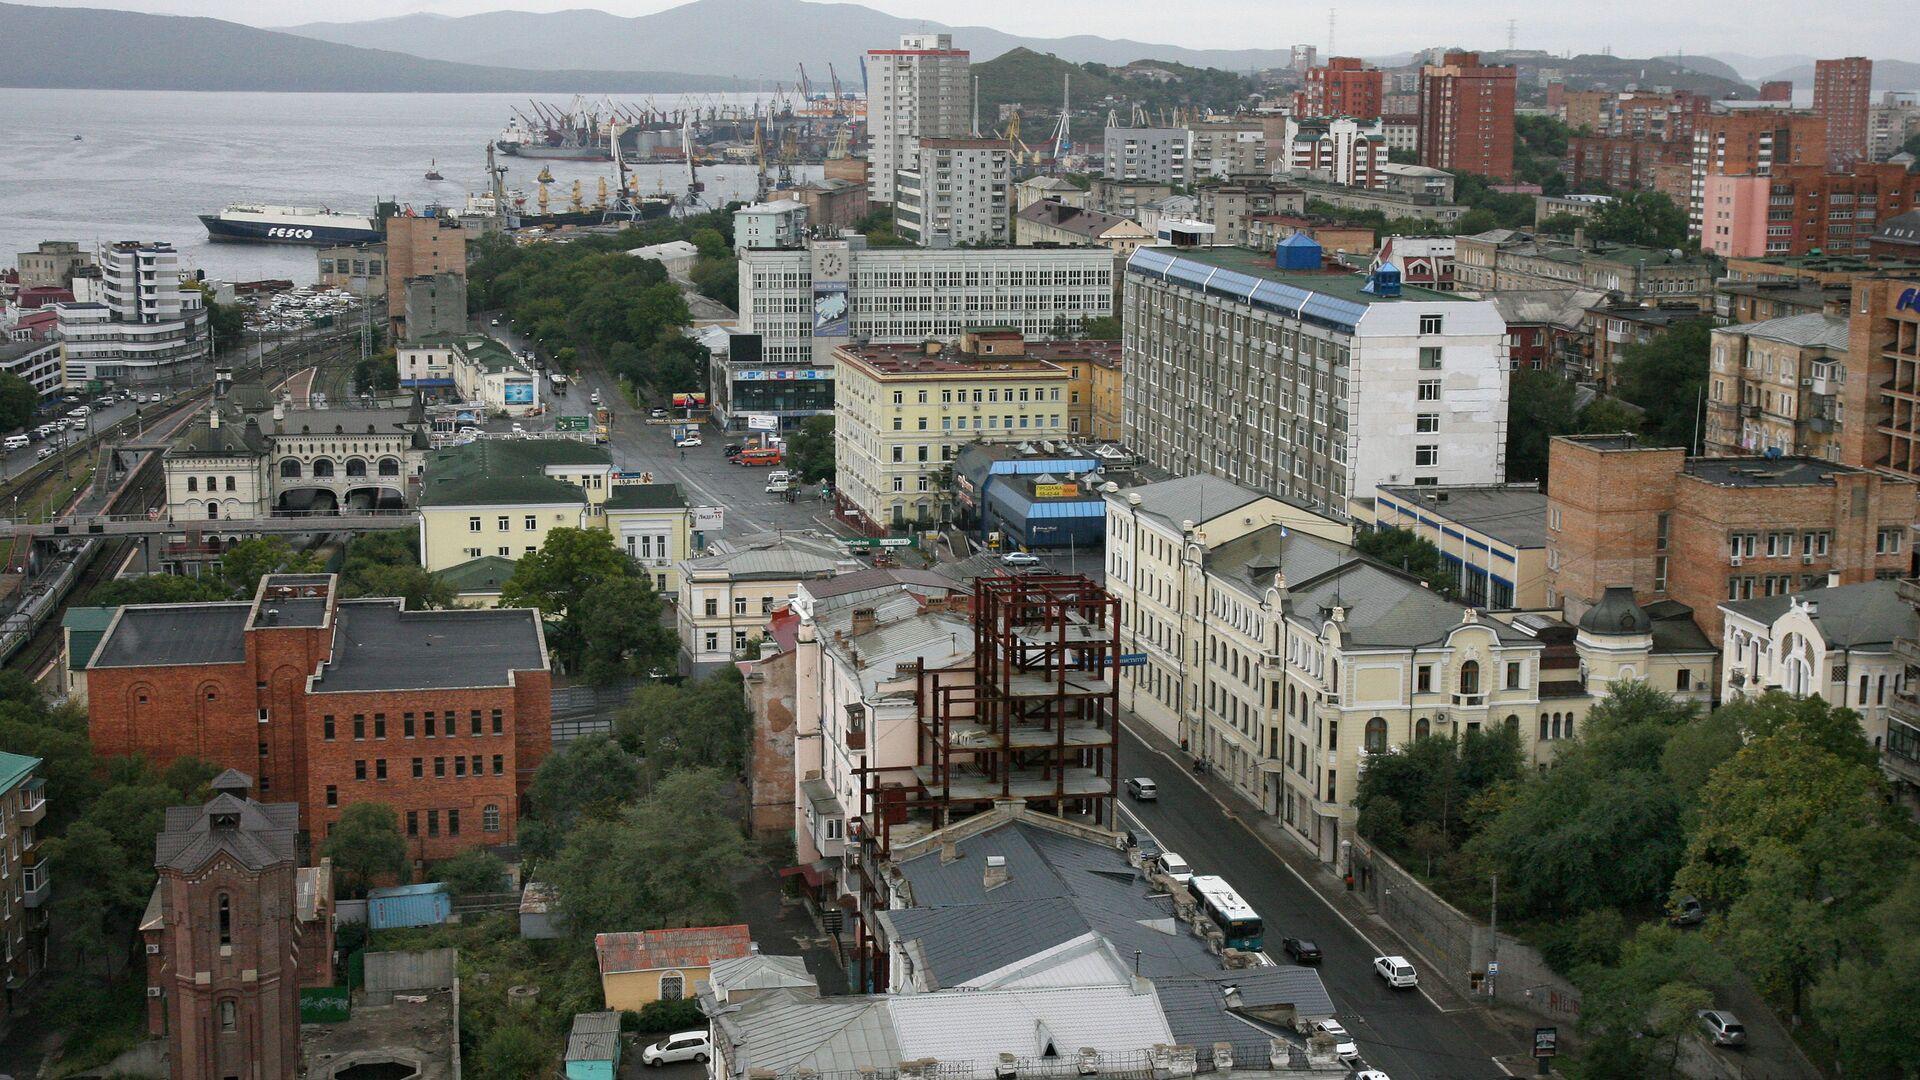 Виды Владивостока - РИА Новости, 1920, 14.04.2021